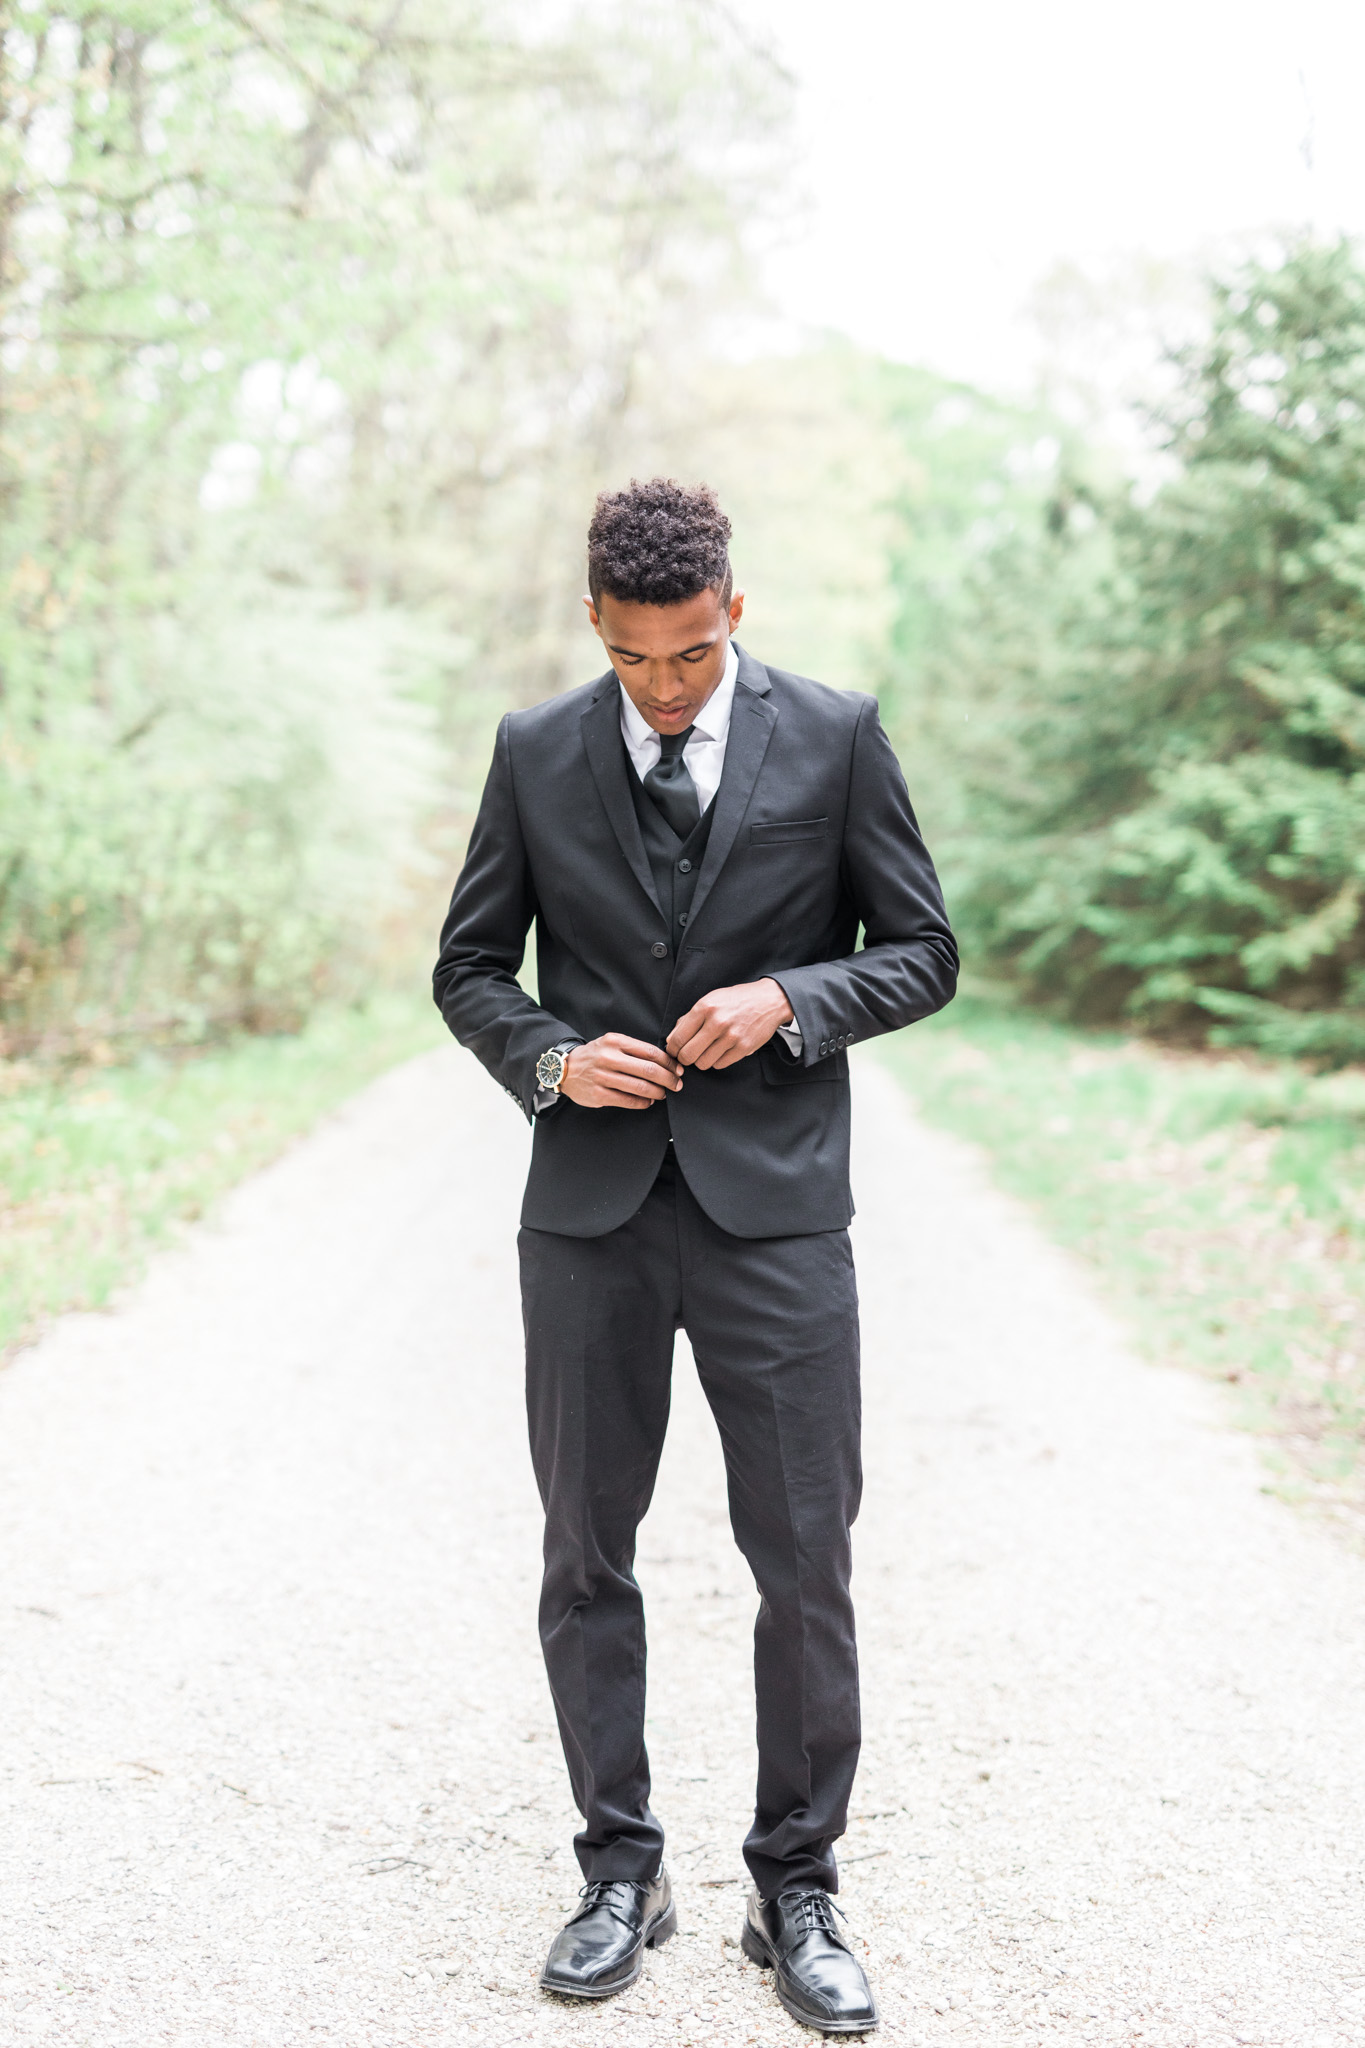 Groom Portrait | Styled Wedding Shoot at Gable Hill Barn | Elegant Chic Wedding | Laurenda Marie Photography | West Michigan Wedding Photographer |